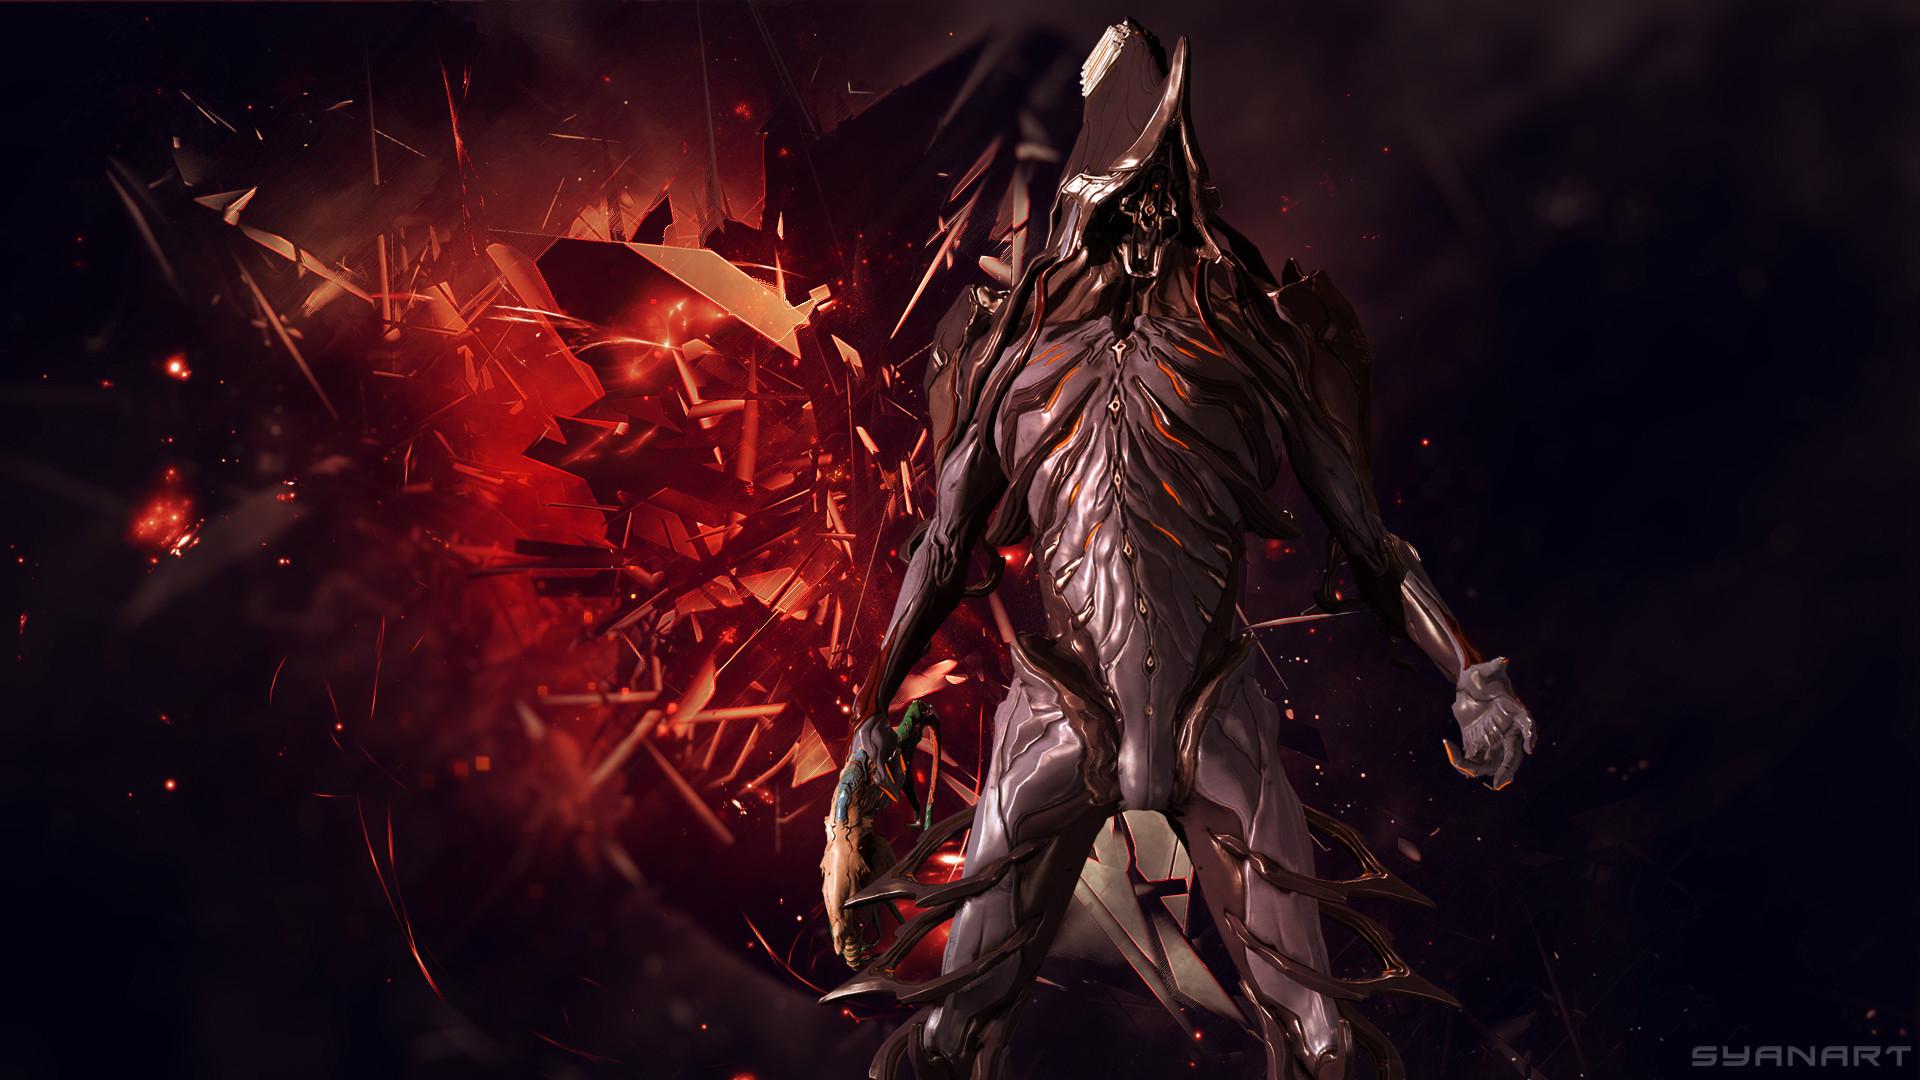 scorpion wallpaper 70 images